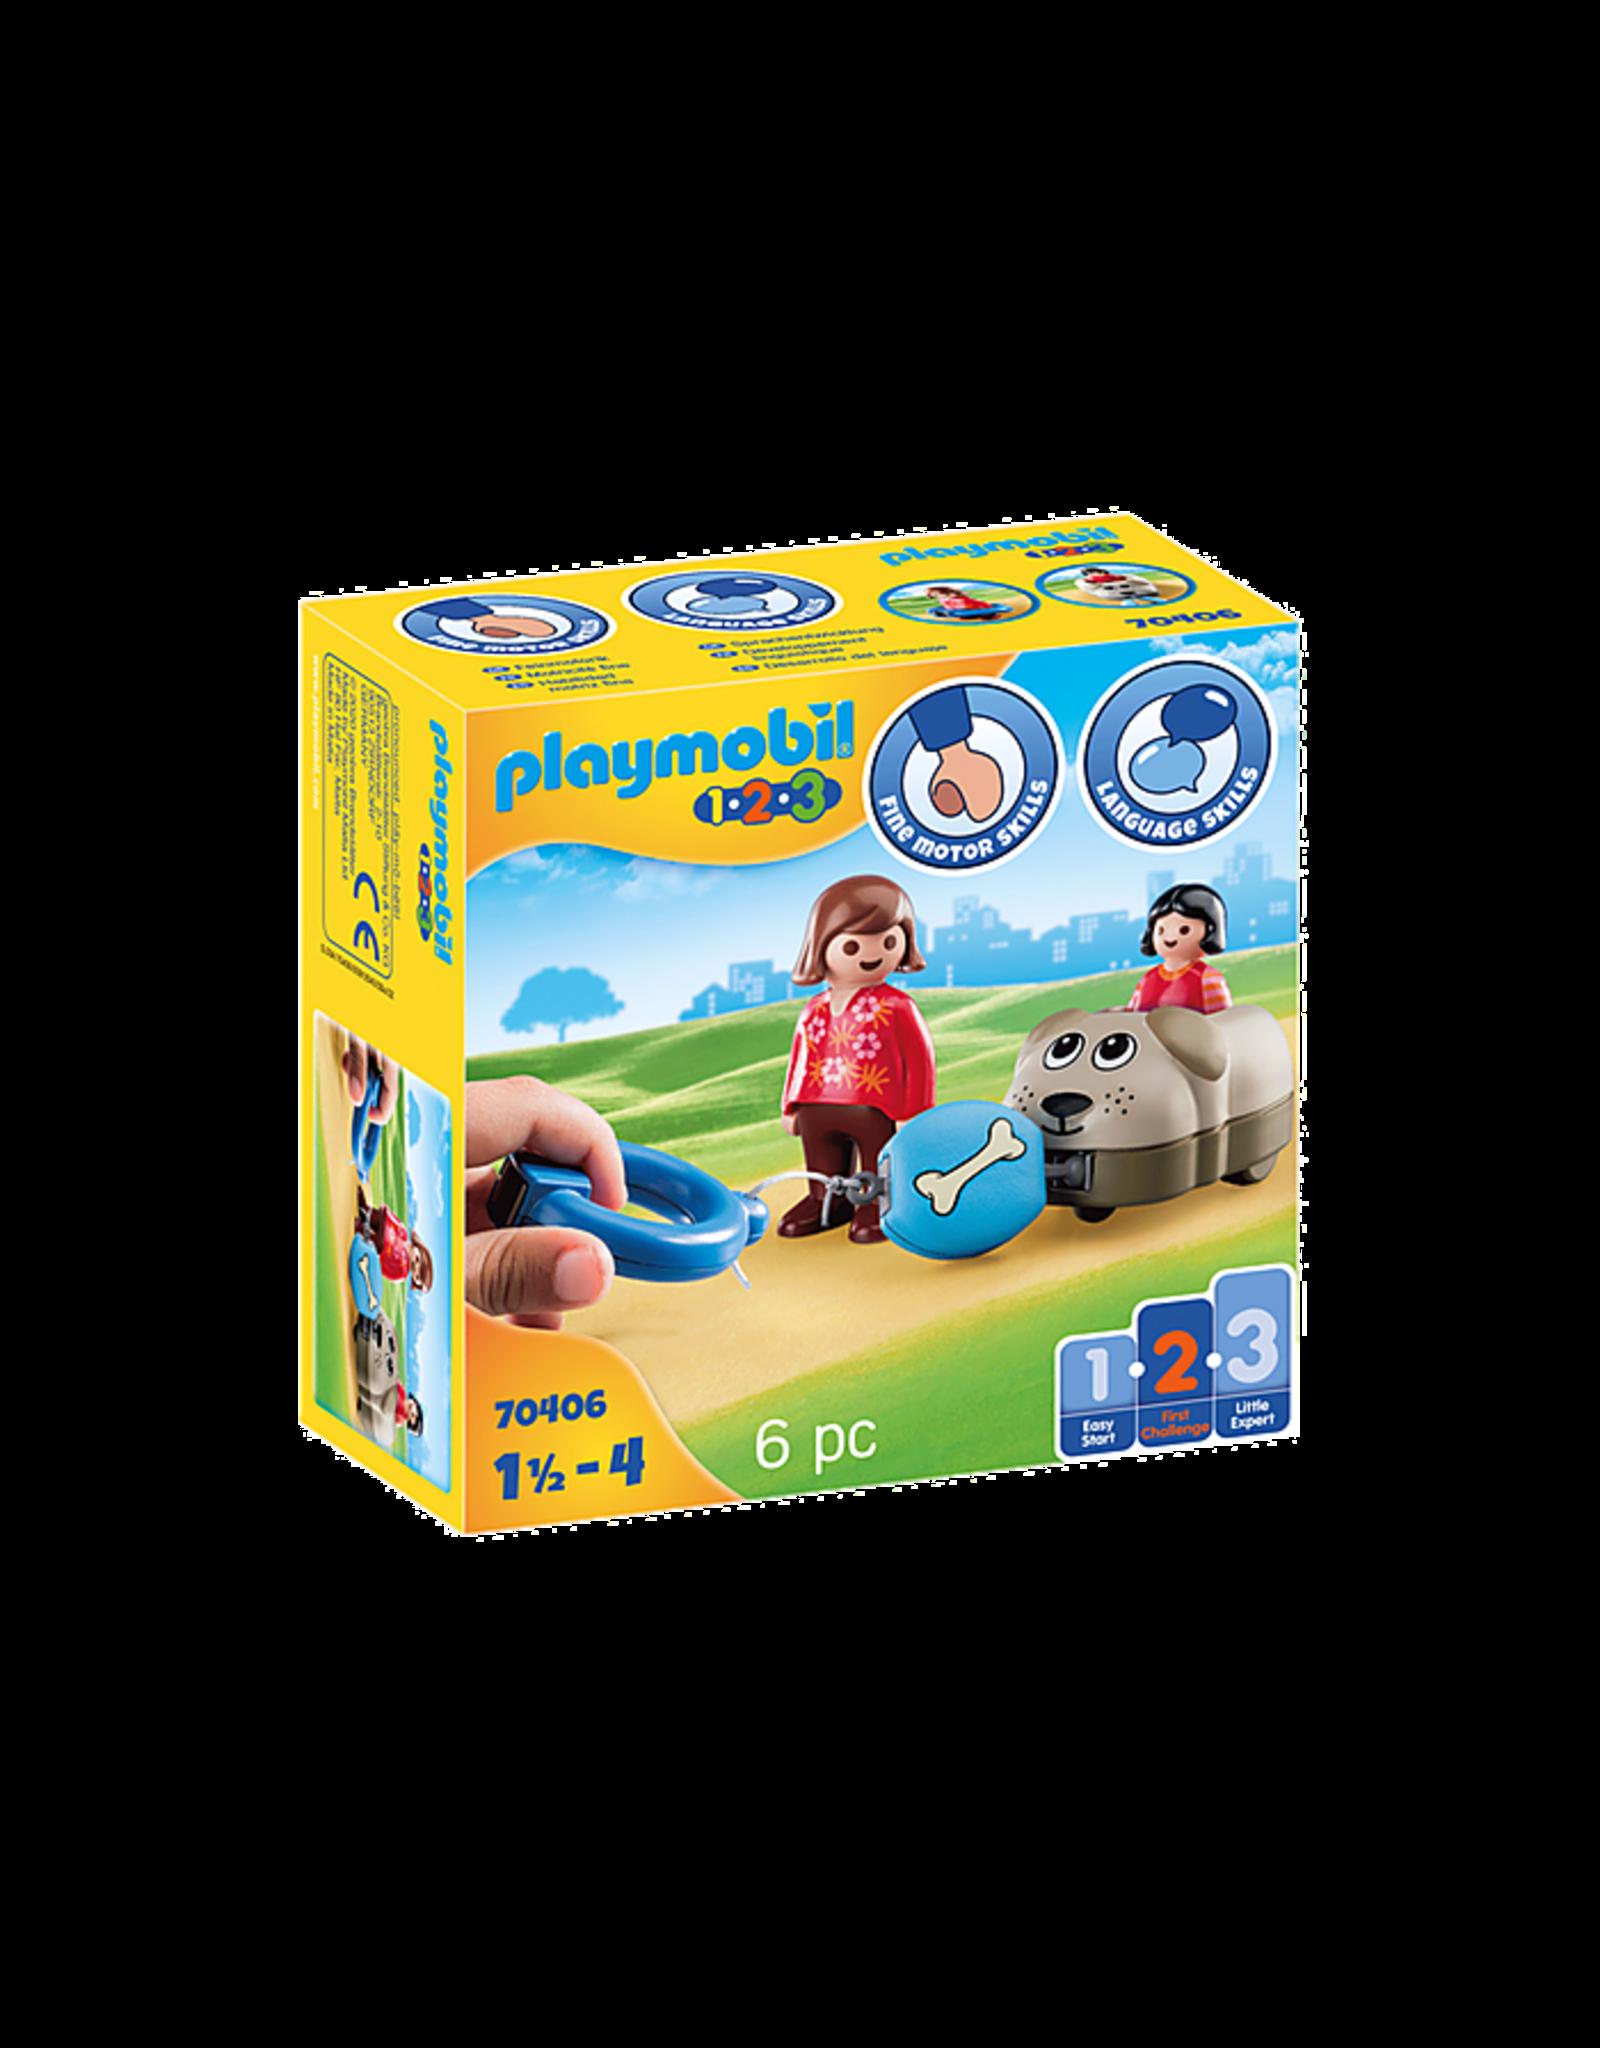 Playmobil Dog Train Car